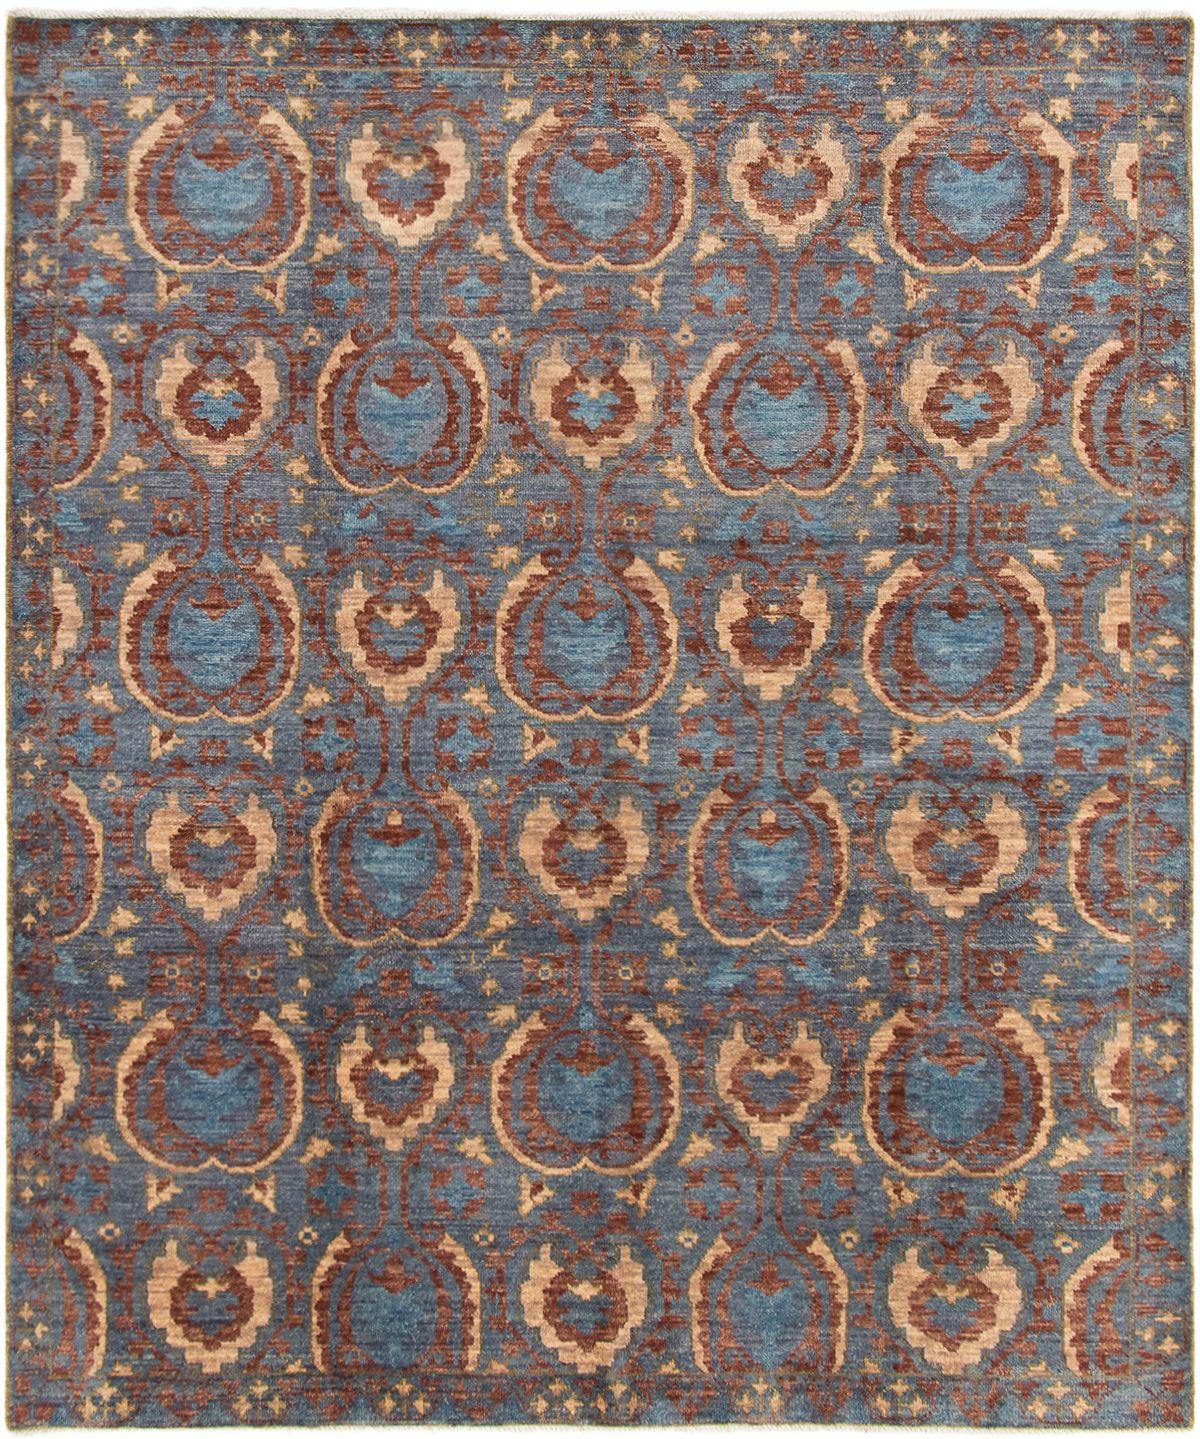 "Hand-knotted Finest Ushak Dark Blue Wool Rug 8'1"" x 9'9"" Size: 8'1"" x 9'9"""